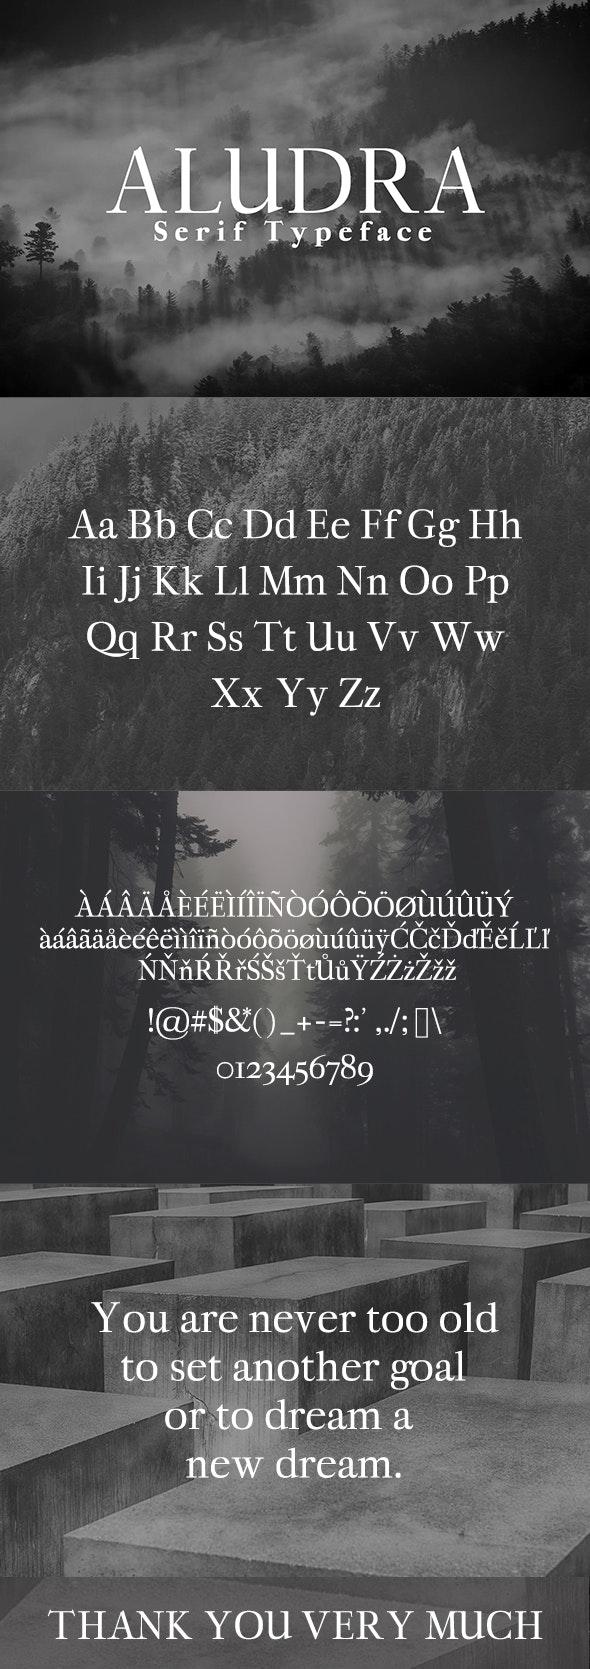 Aludra Serif Typeface - Serif Fonts